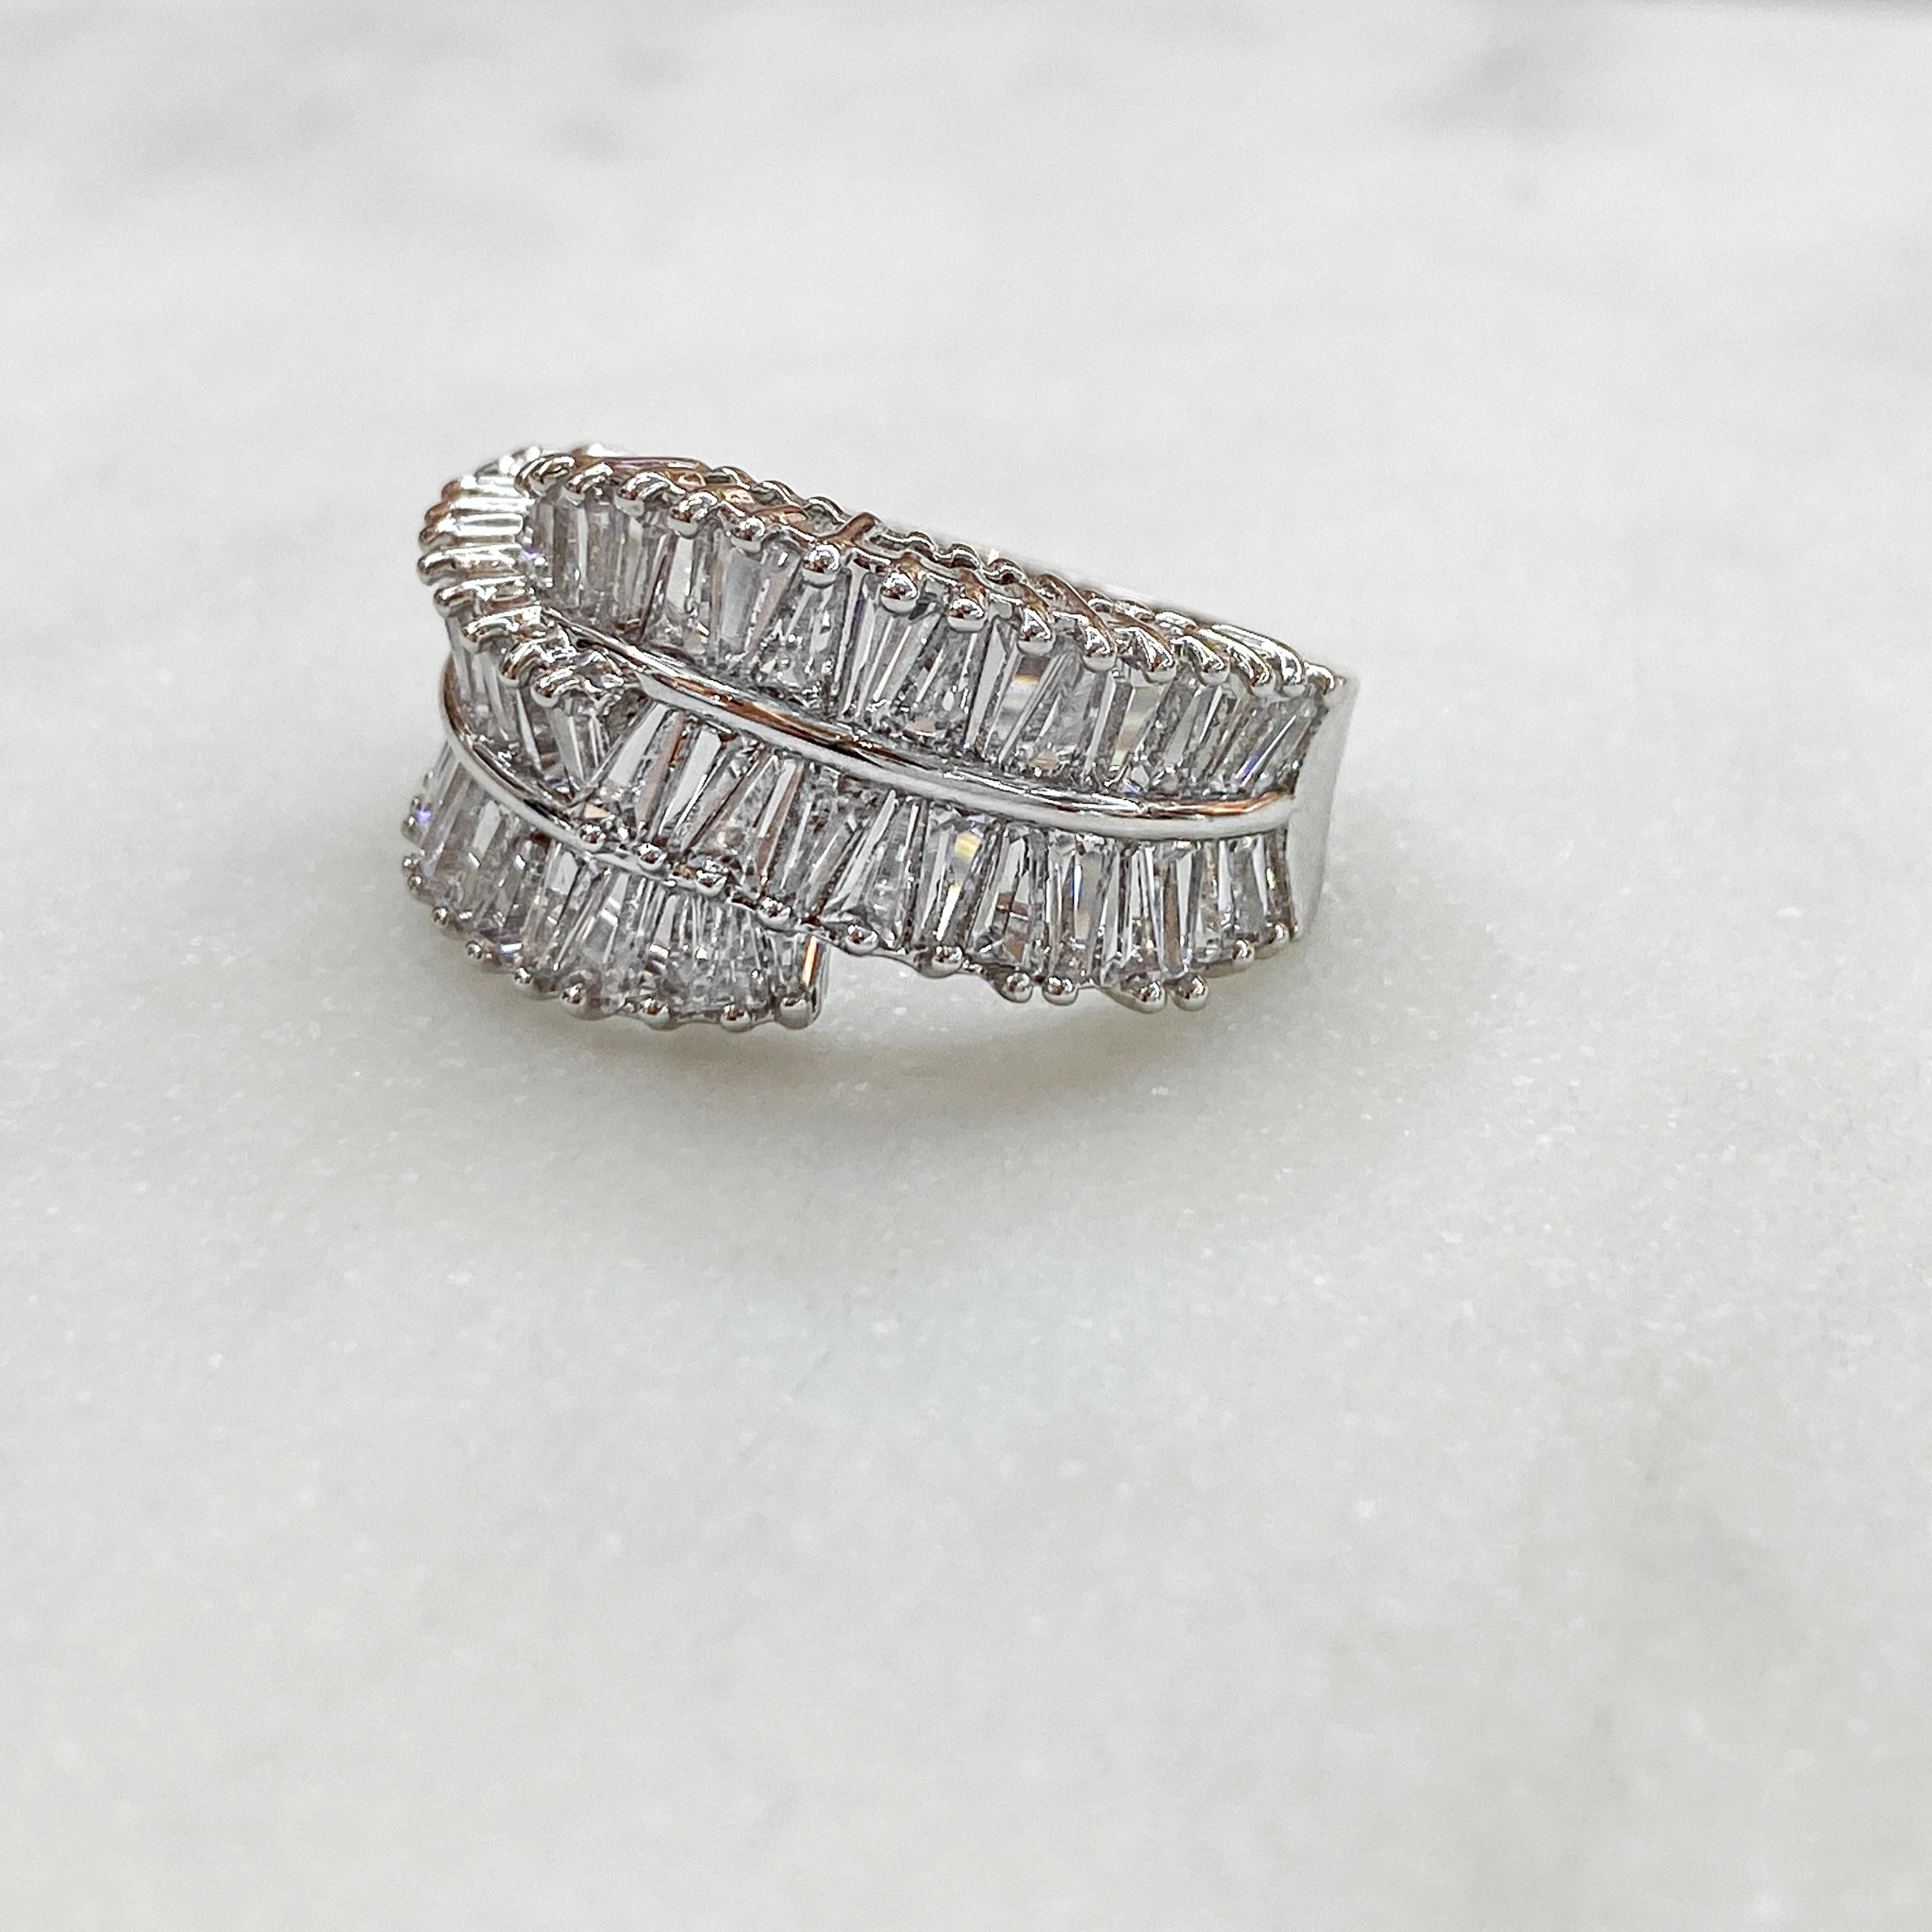 Кольцо с трапецевидными цирконами серебр (юв.сплав)